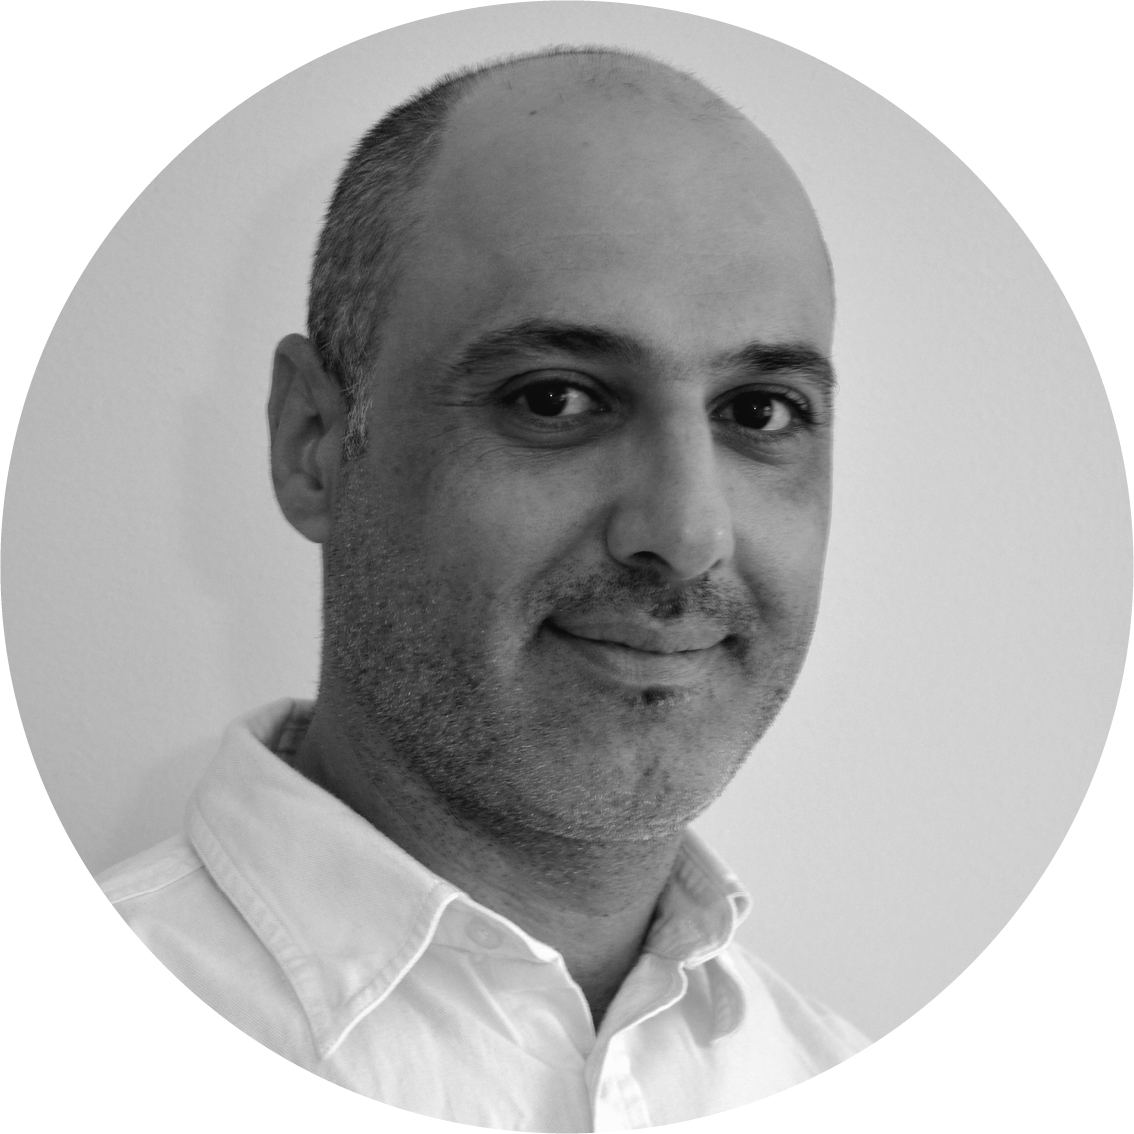 Talal Hirmiz